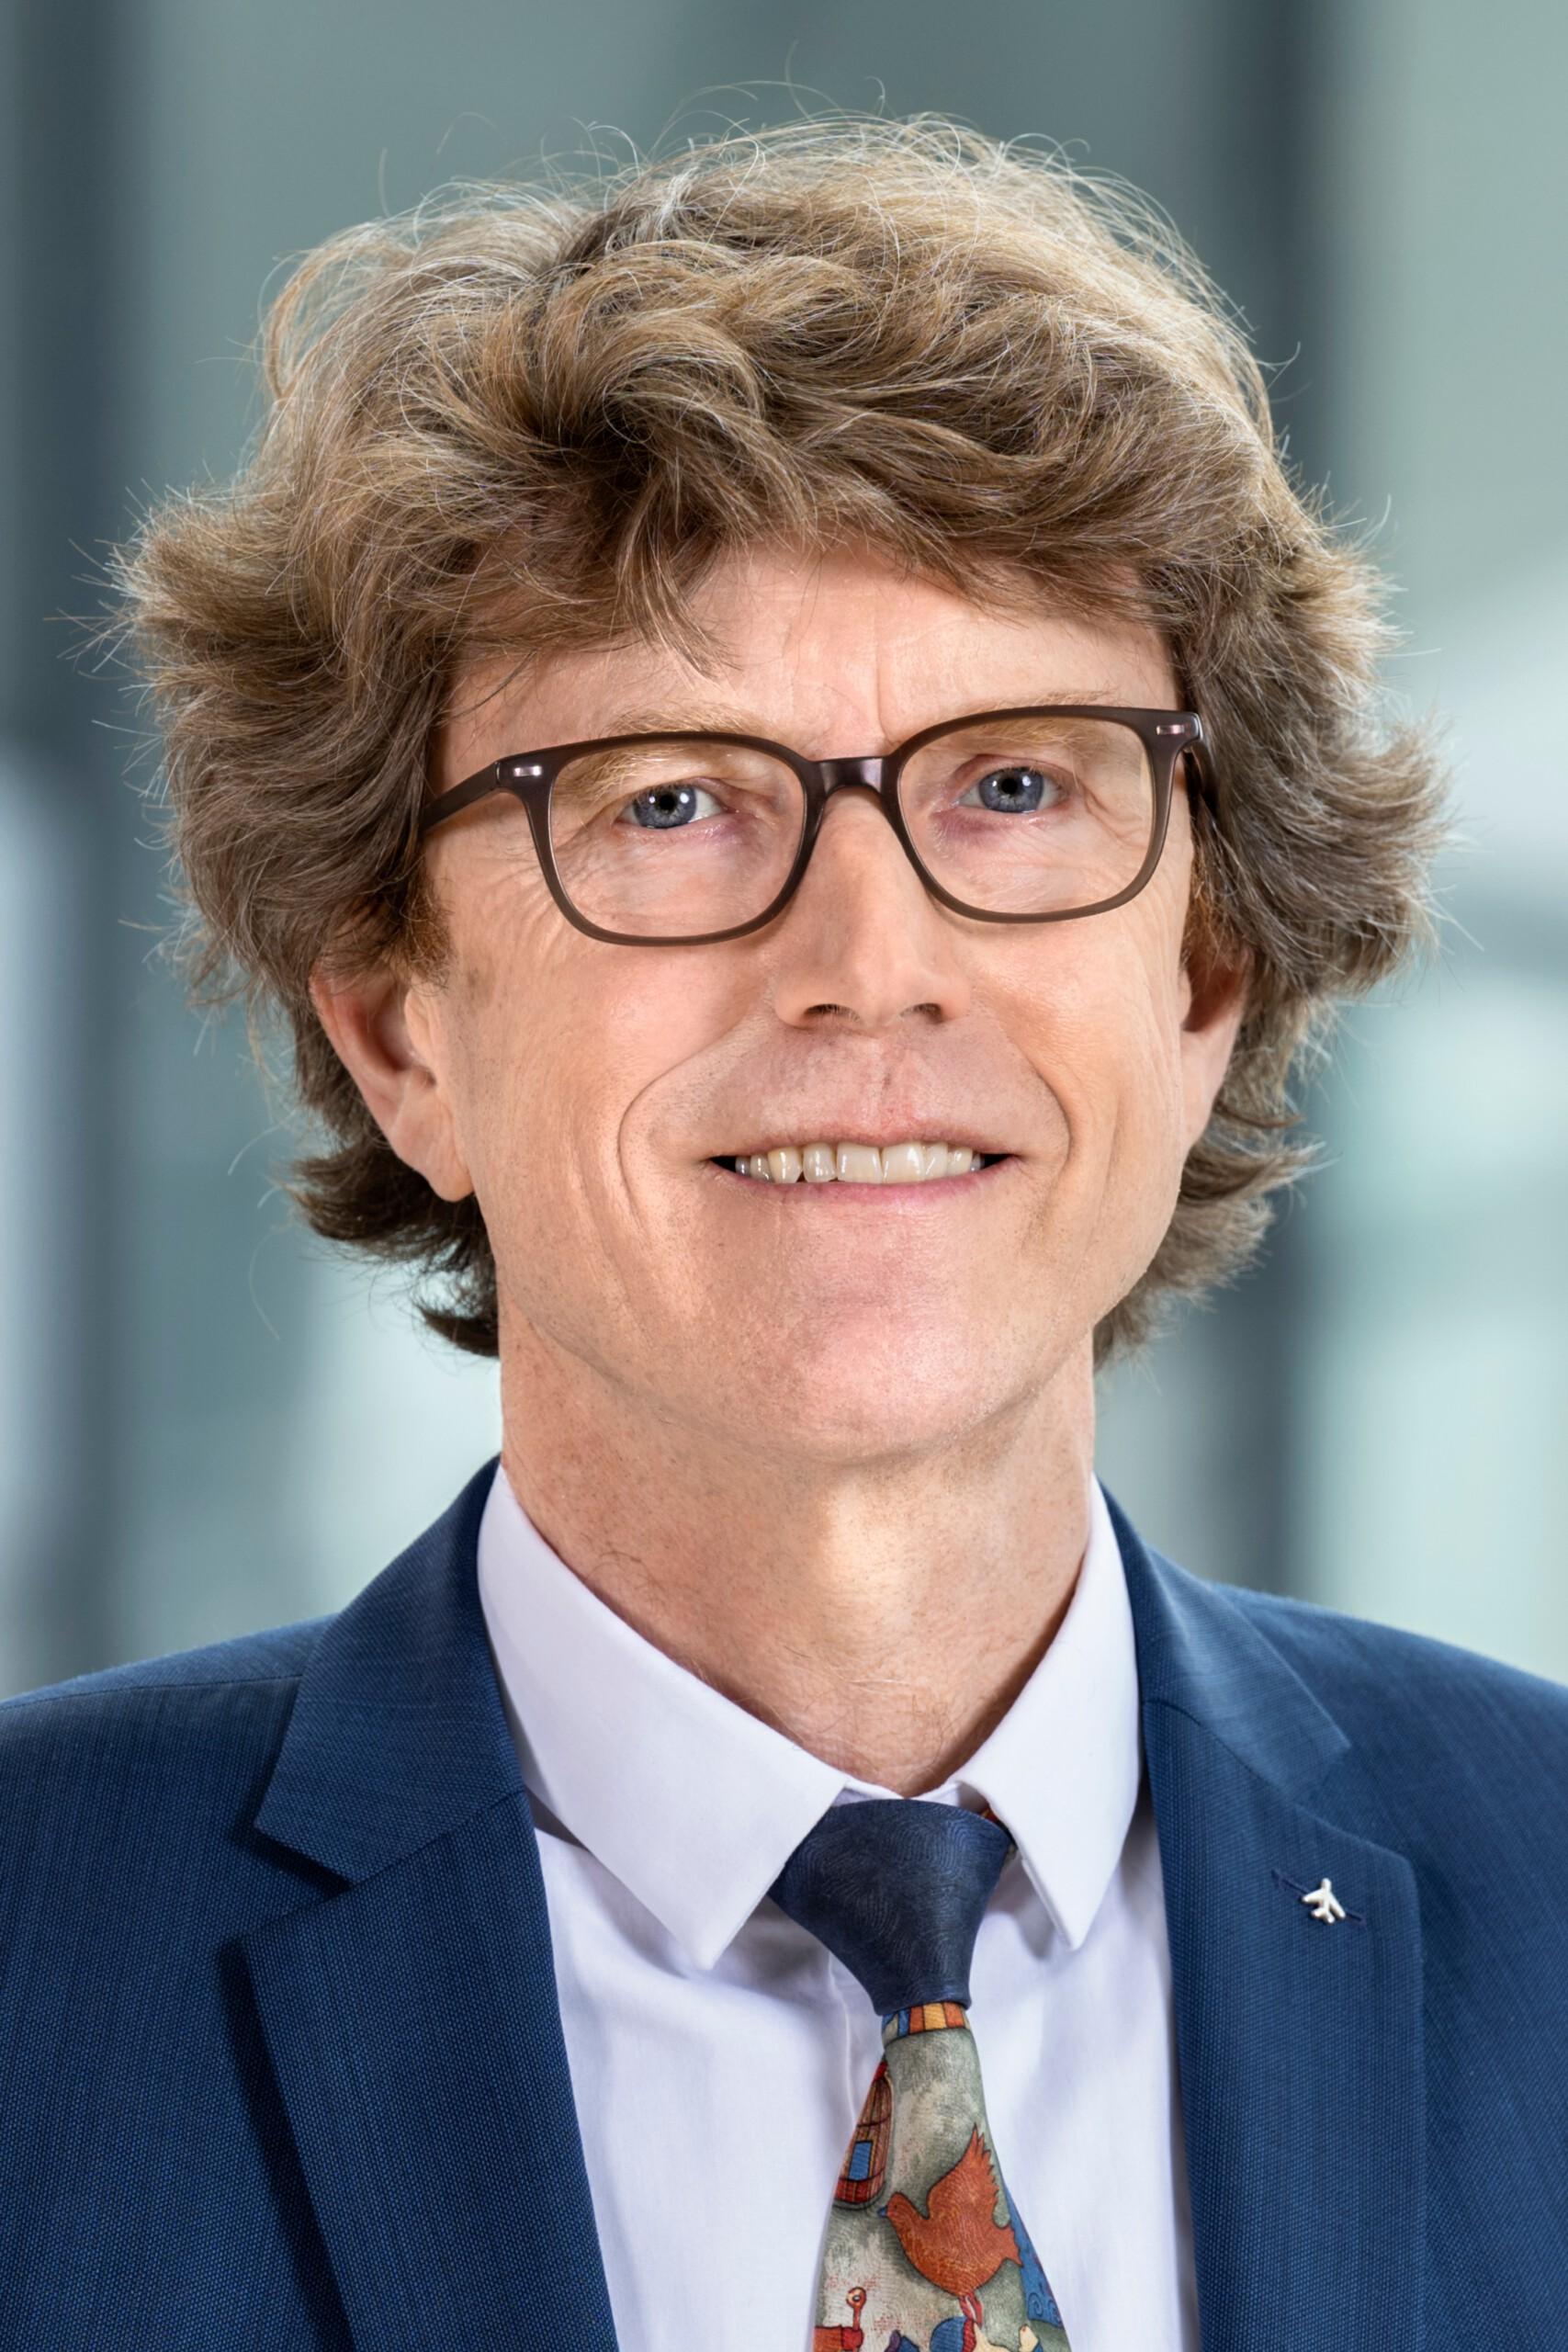 PROF. DR. ENGELBERT LÜTKE DALDRUP